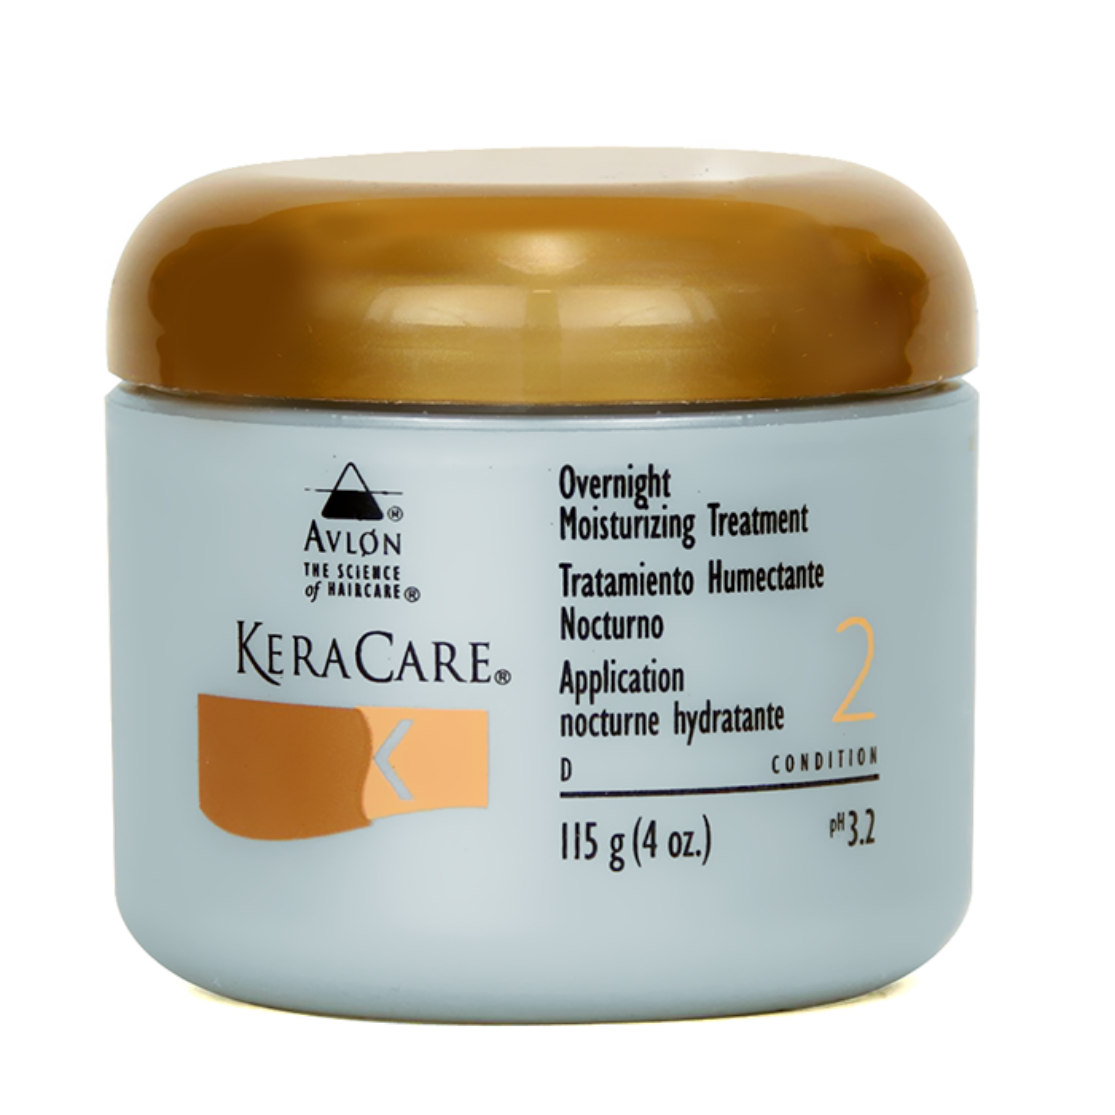 keracare-overnight-moisturizing-treatment